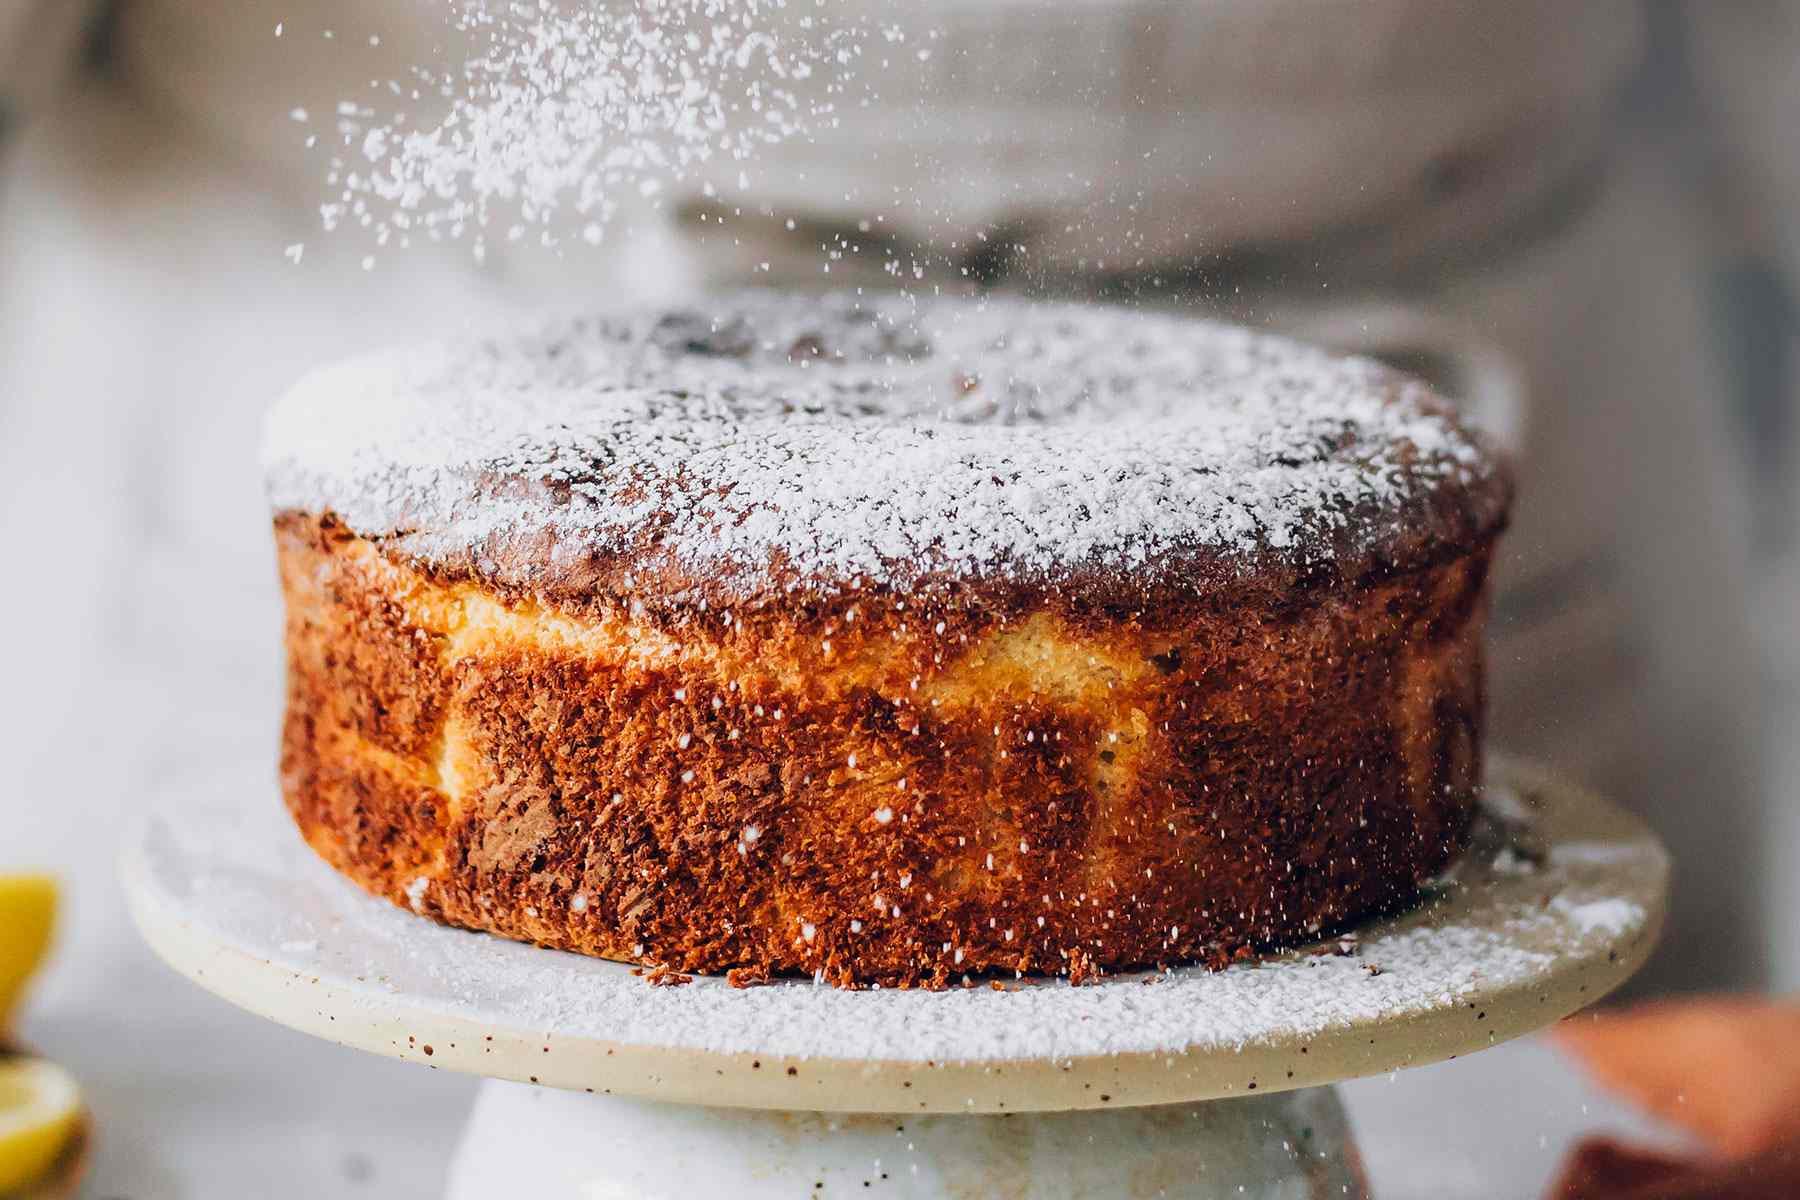 Flourless Italian almond-lemon cake dusted with sugar